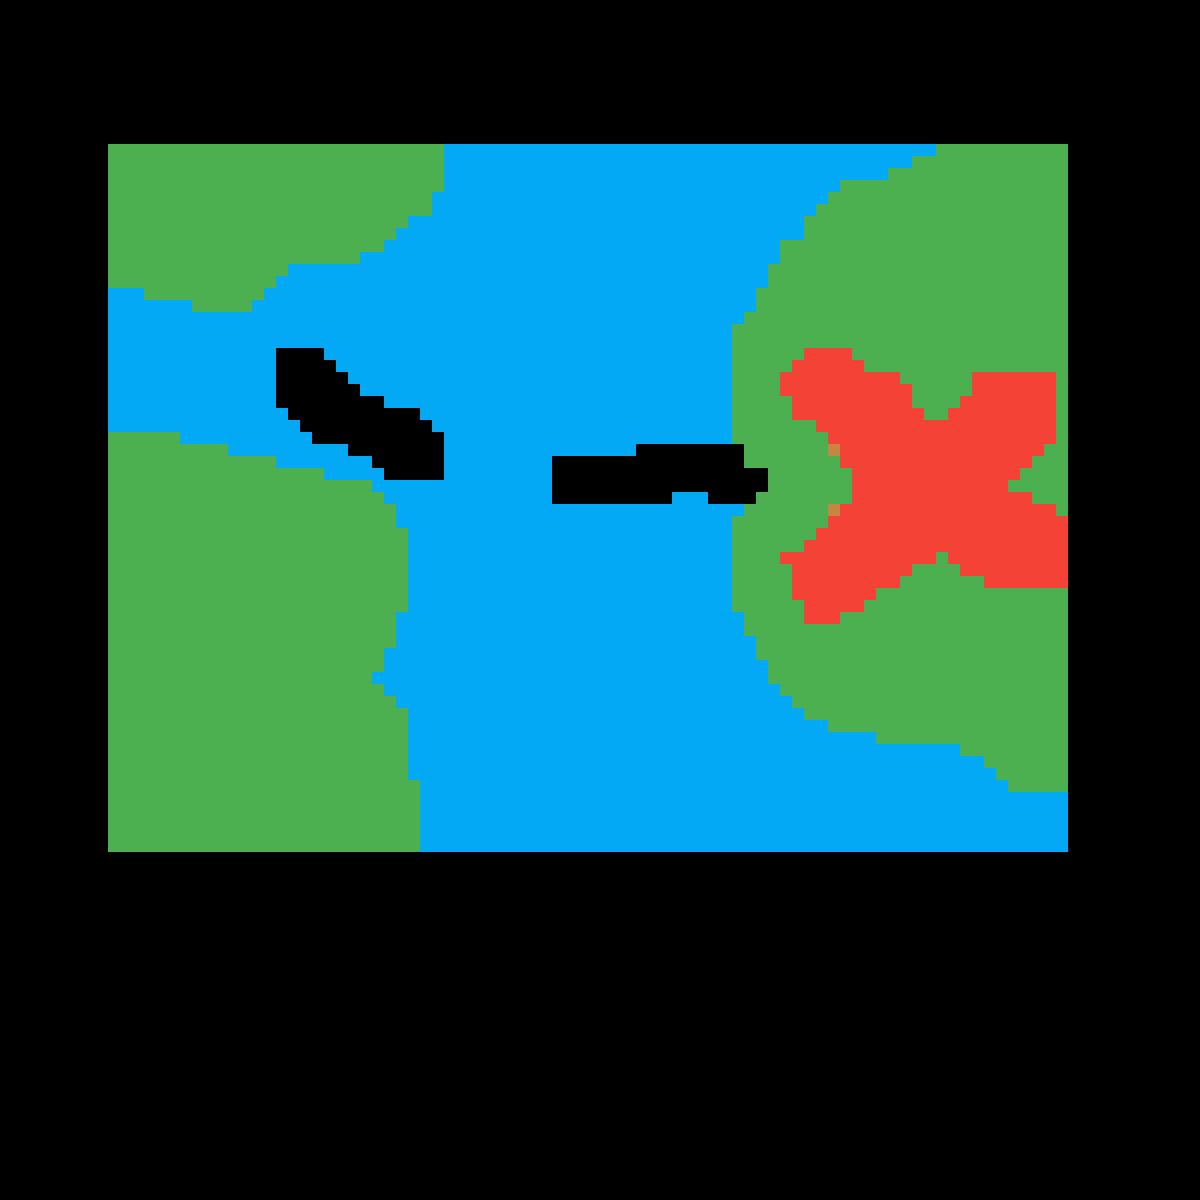 Map by That-random-gal